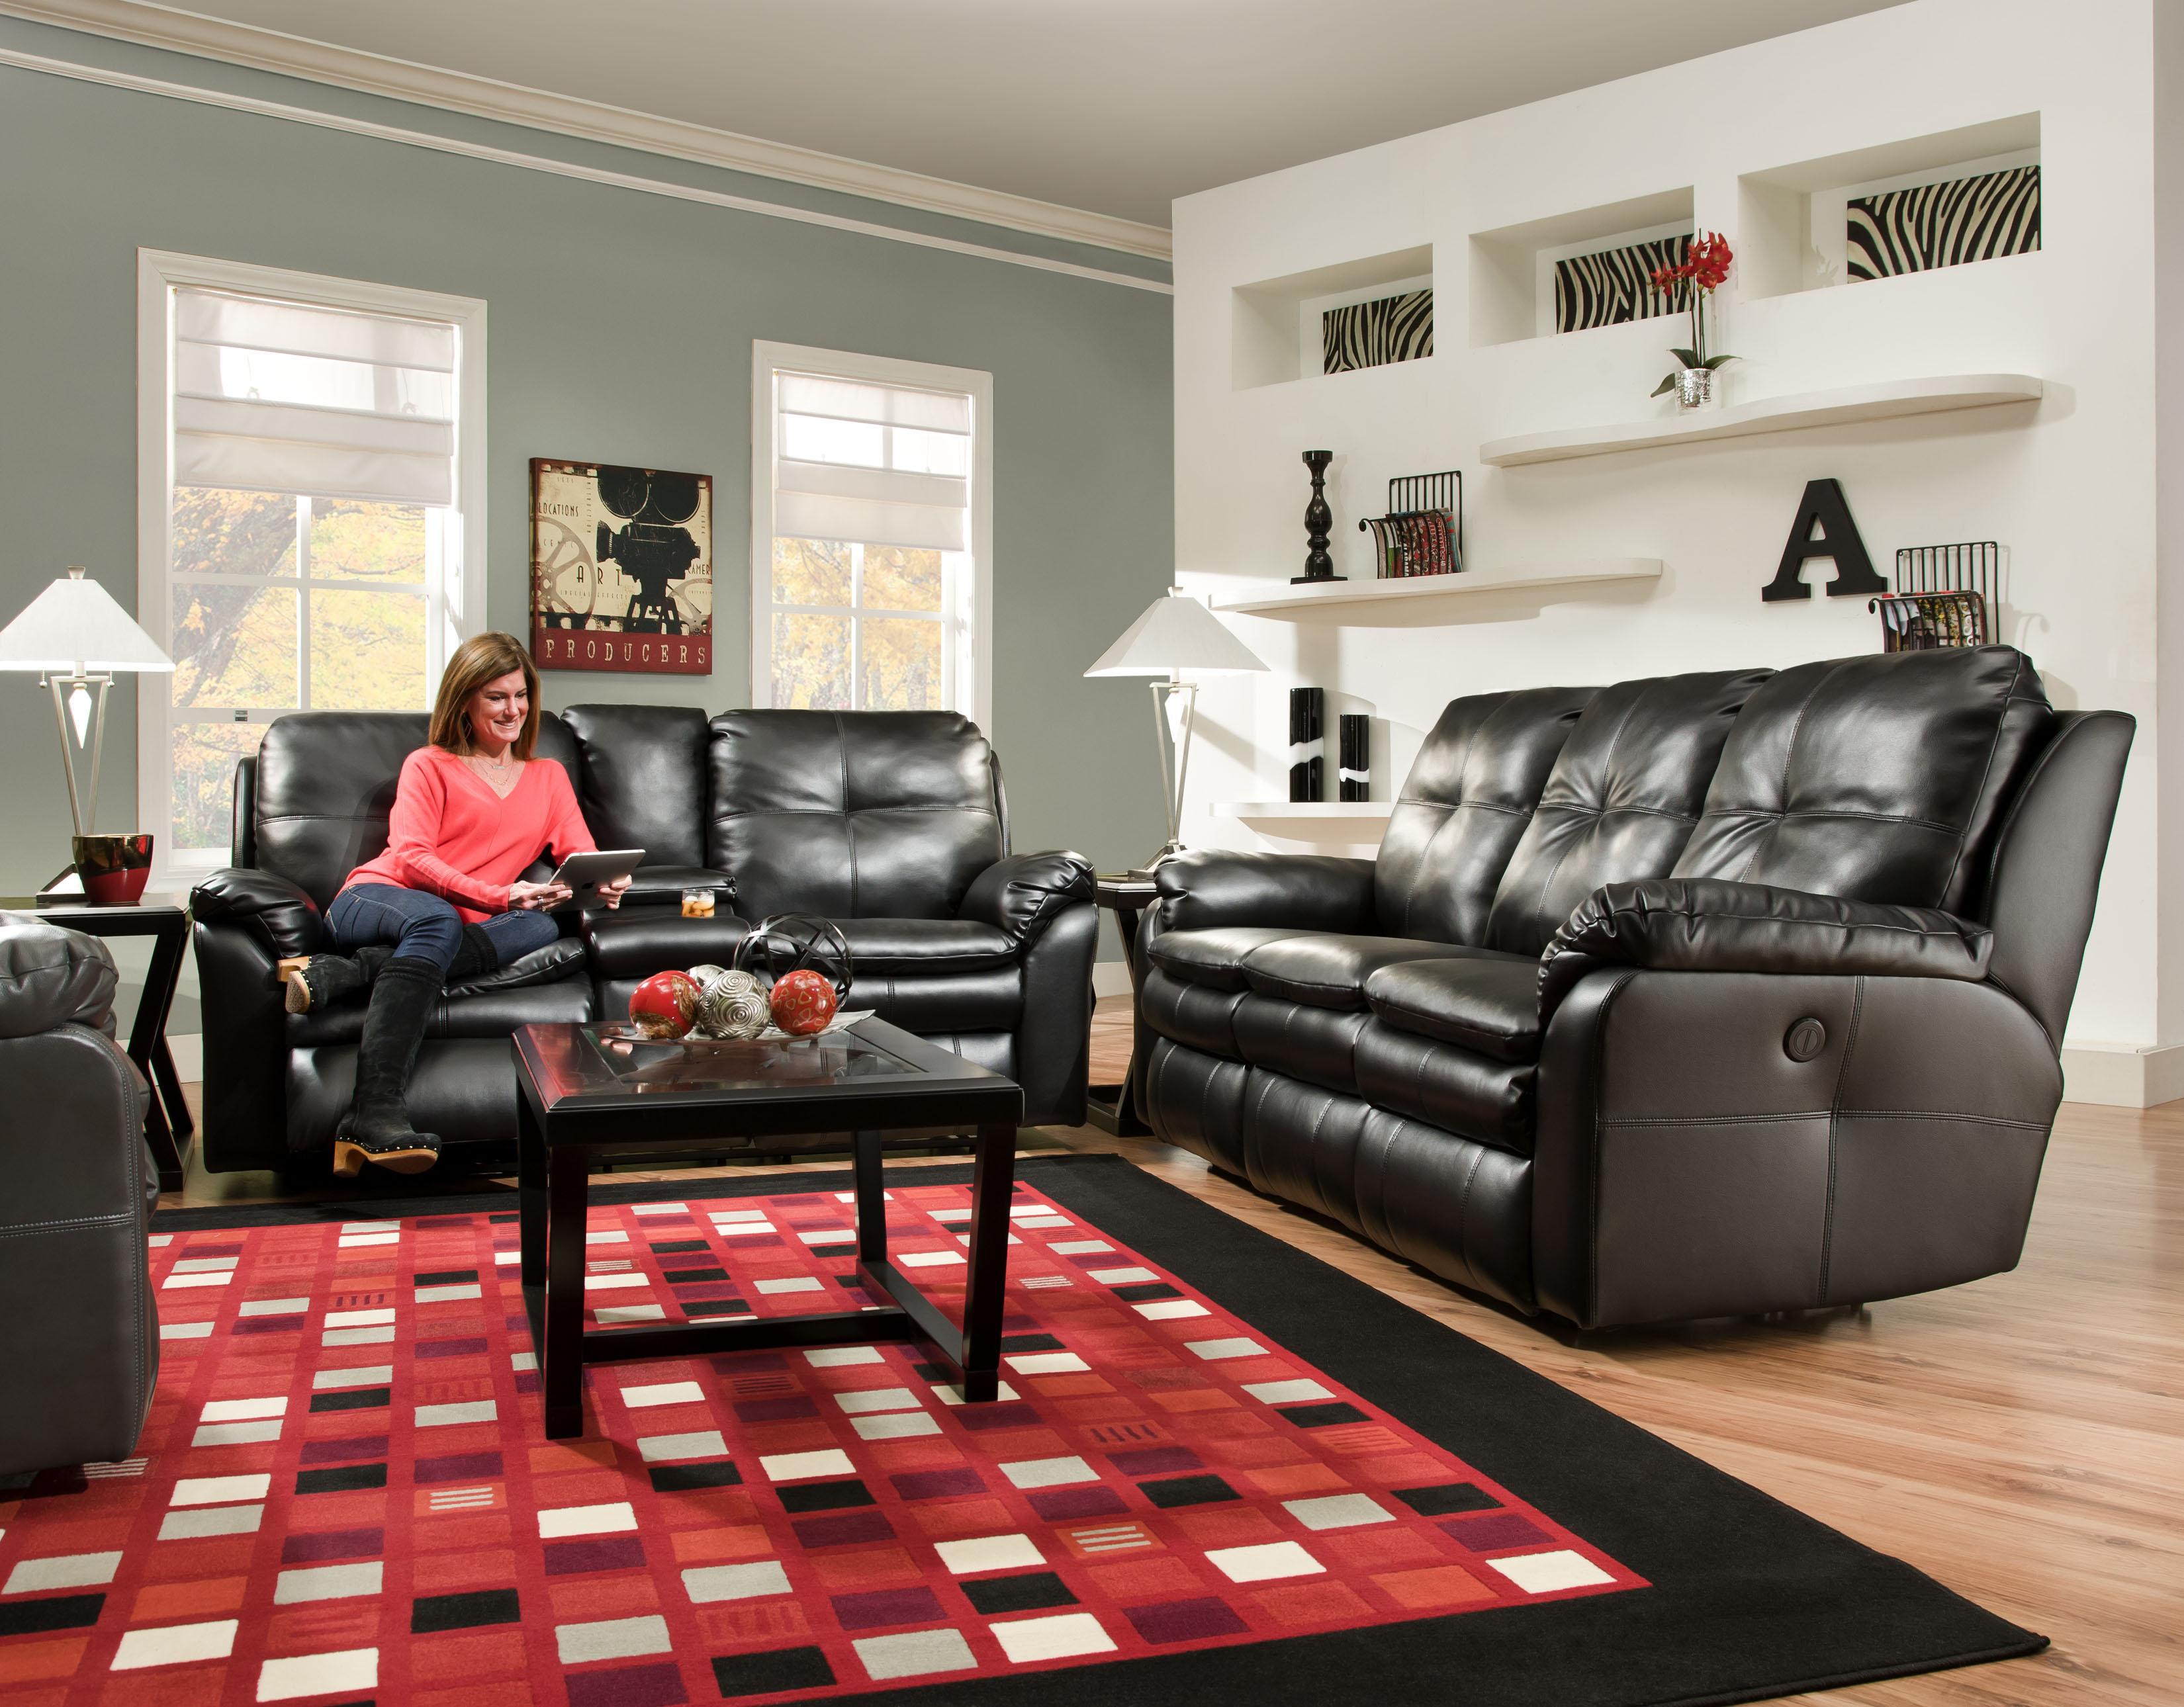 Southern Motion Living Room Furniture. southern motion bullard ...